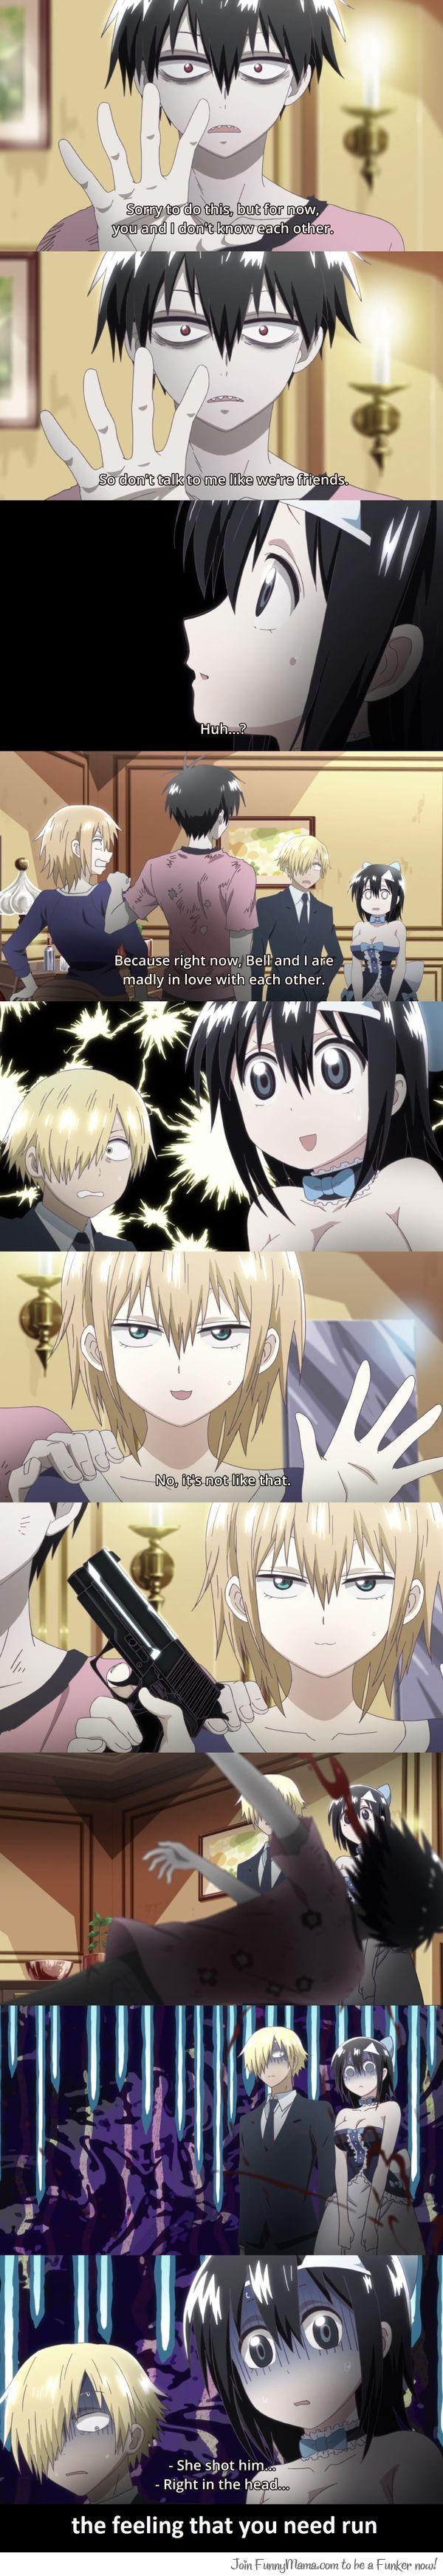 Staz declare,bell-chan answer